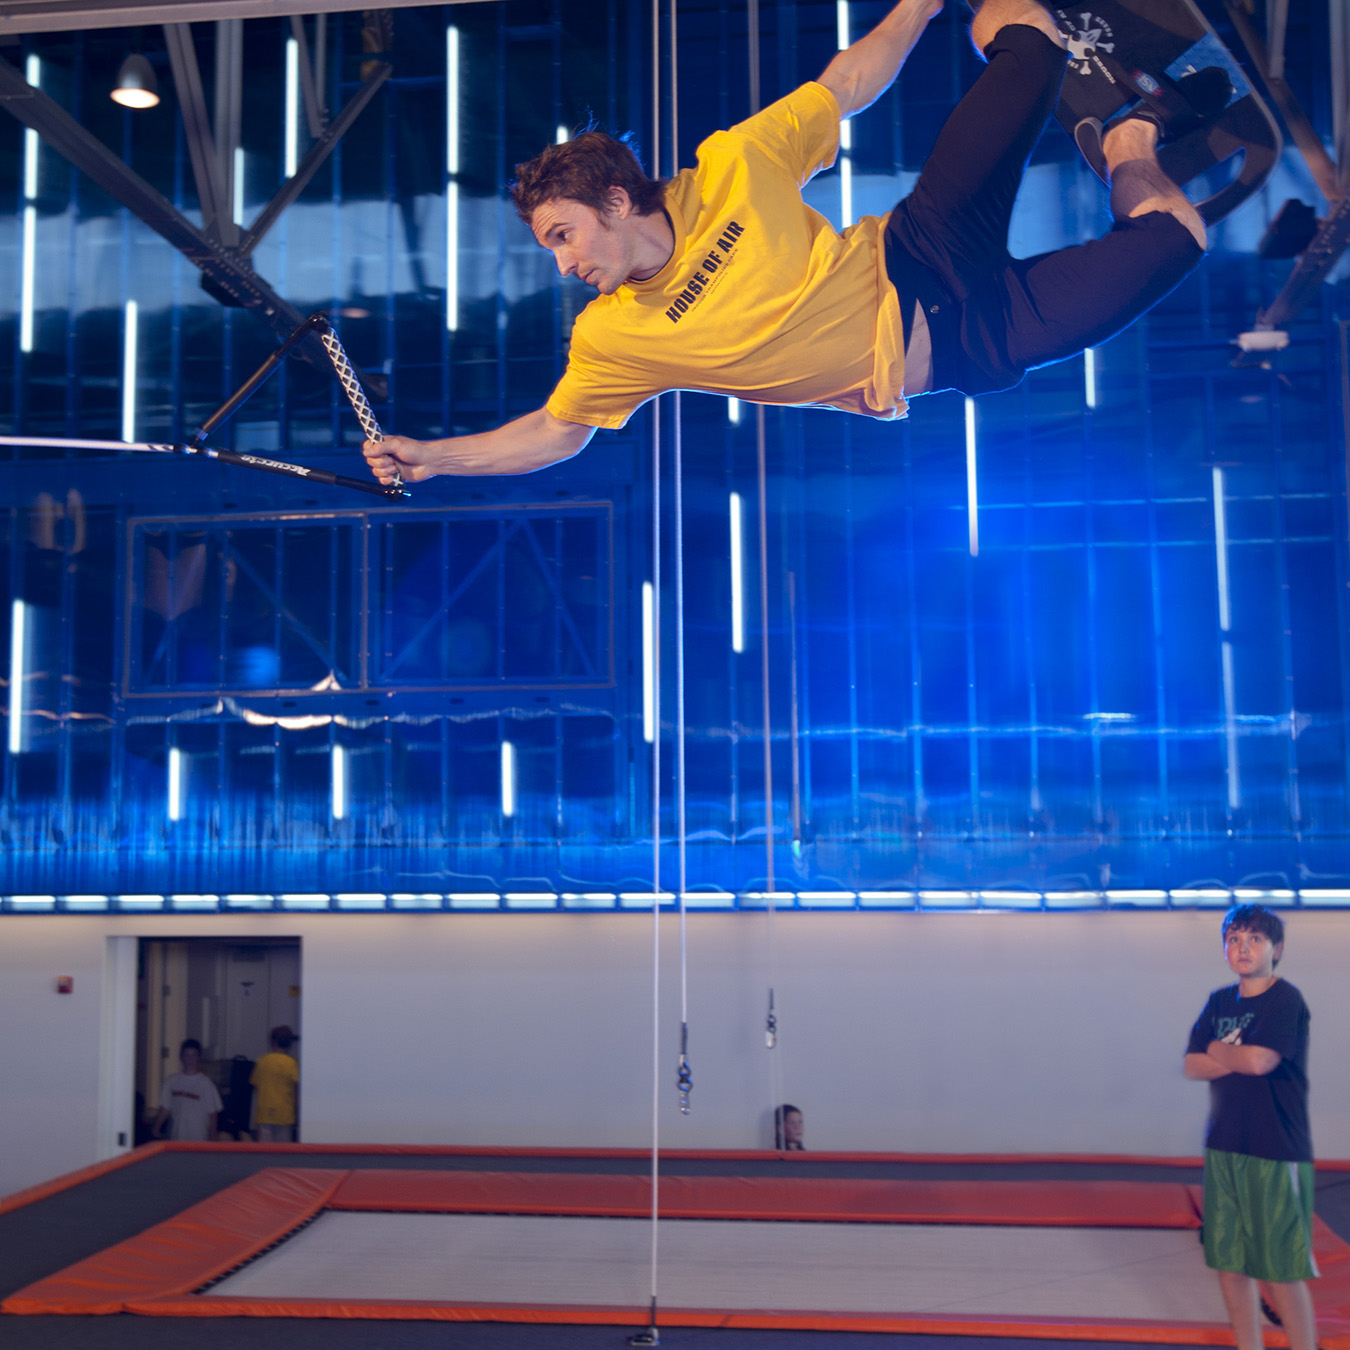 Presidio House of Air interior: athlete does freestlye aerial maneuver